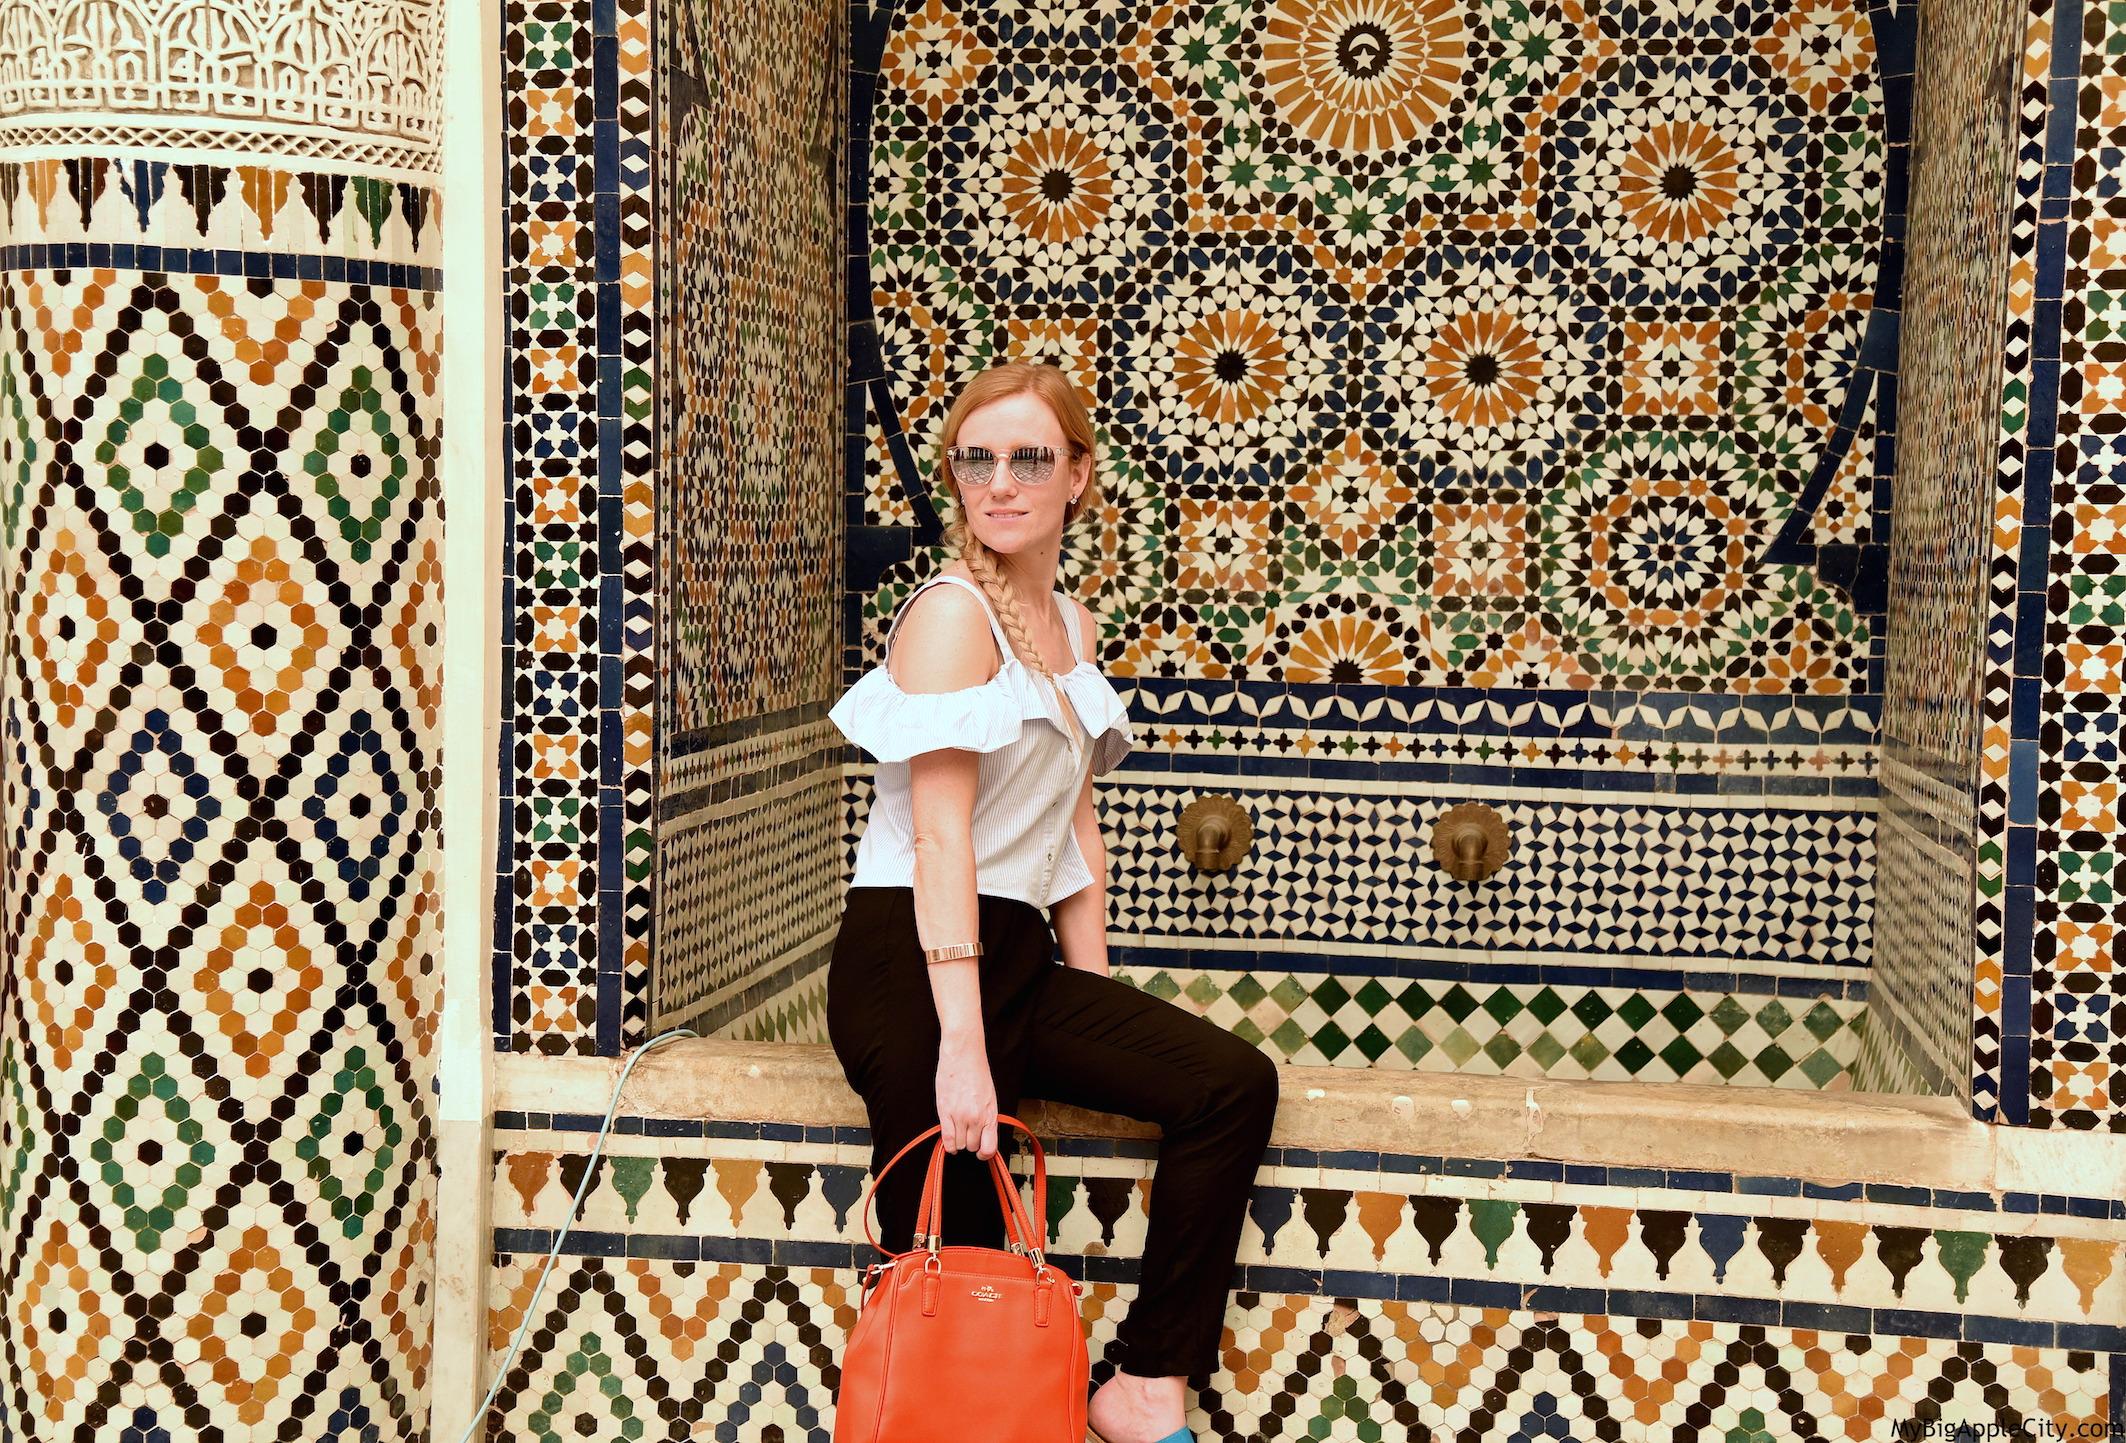 Blogueuse-Mode-Fashion-Summer-Look-MyBigAppleCity